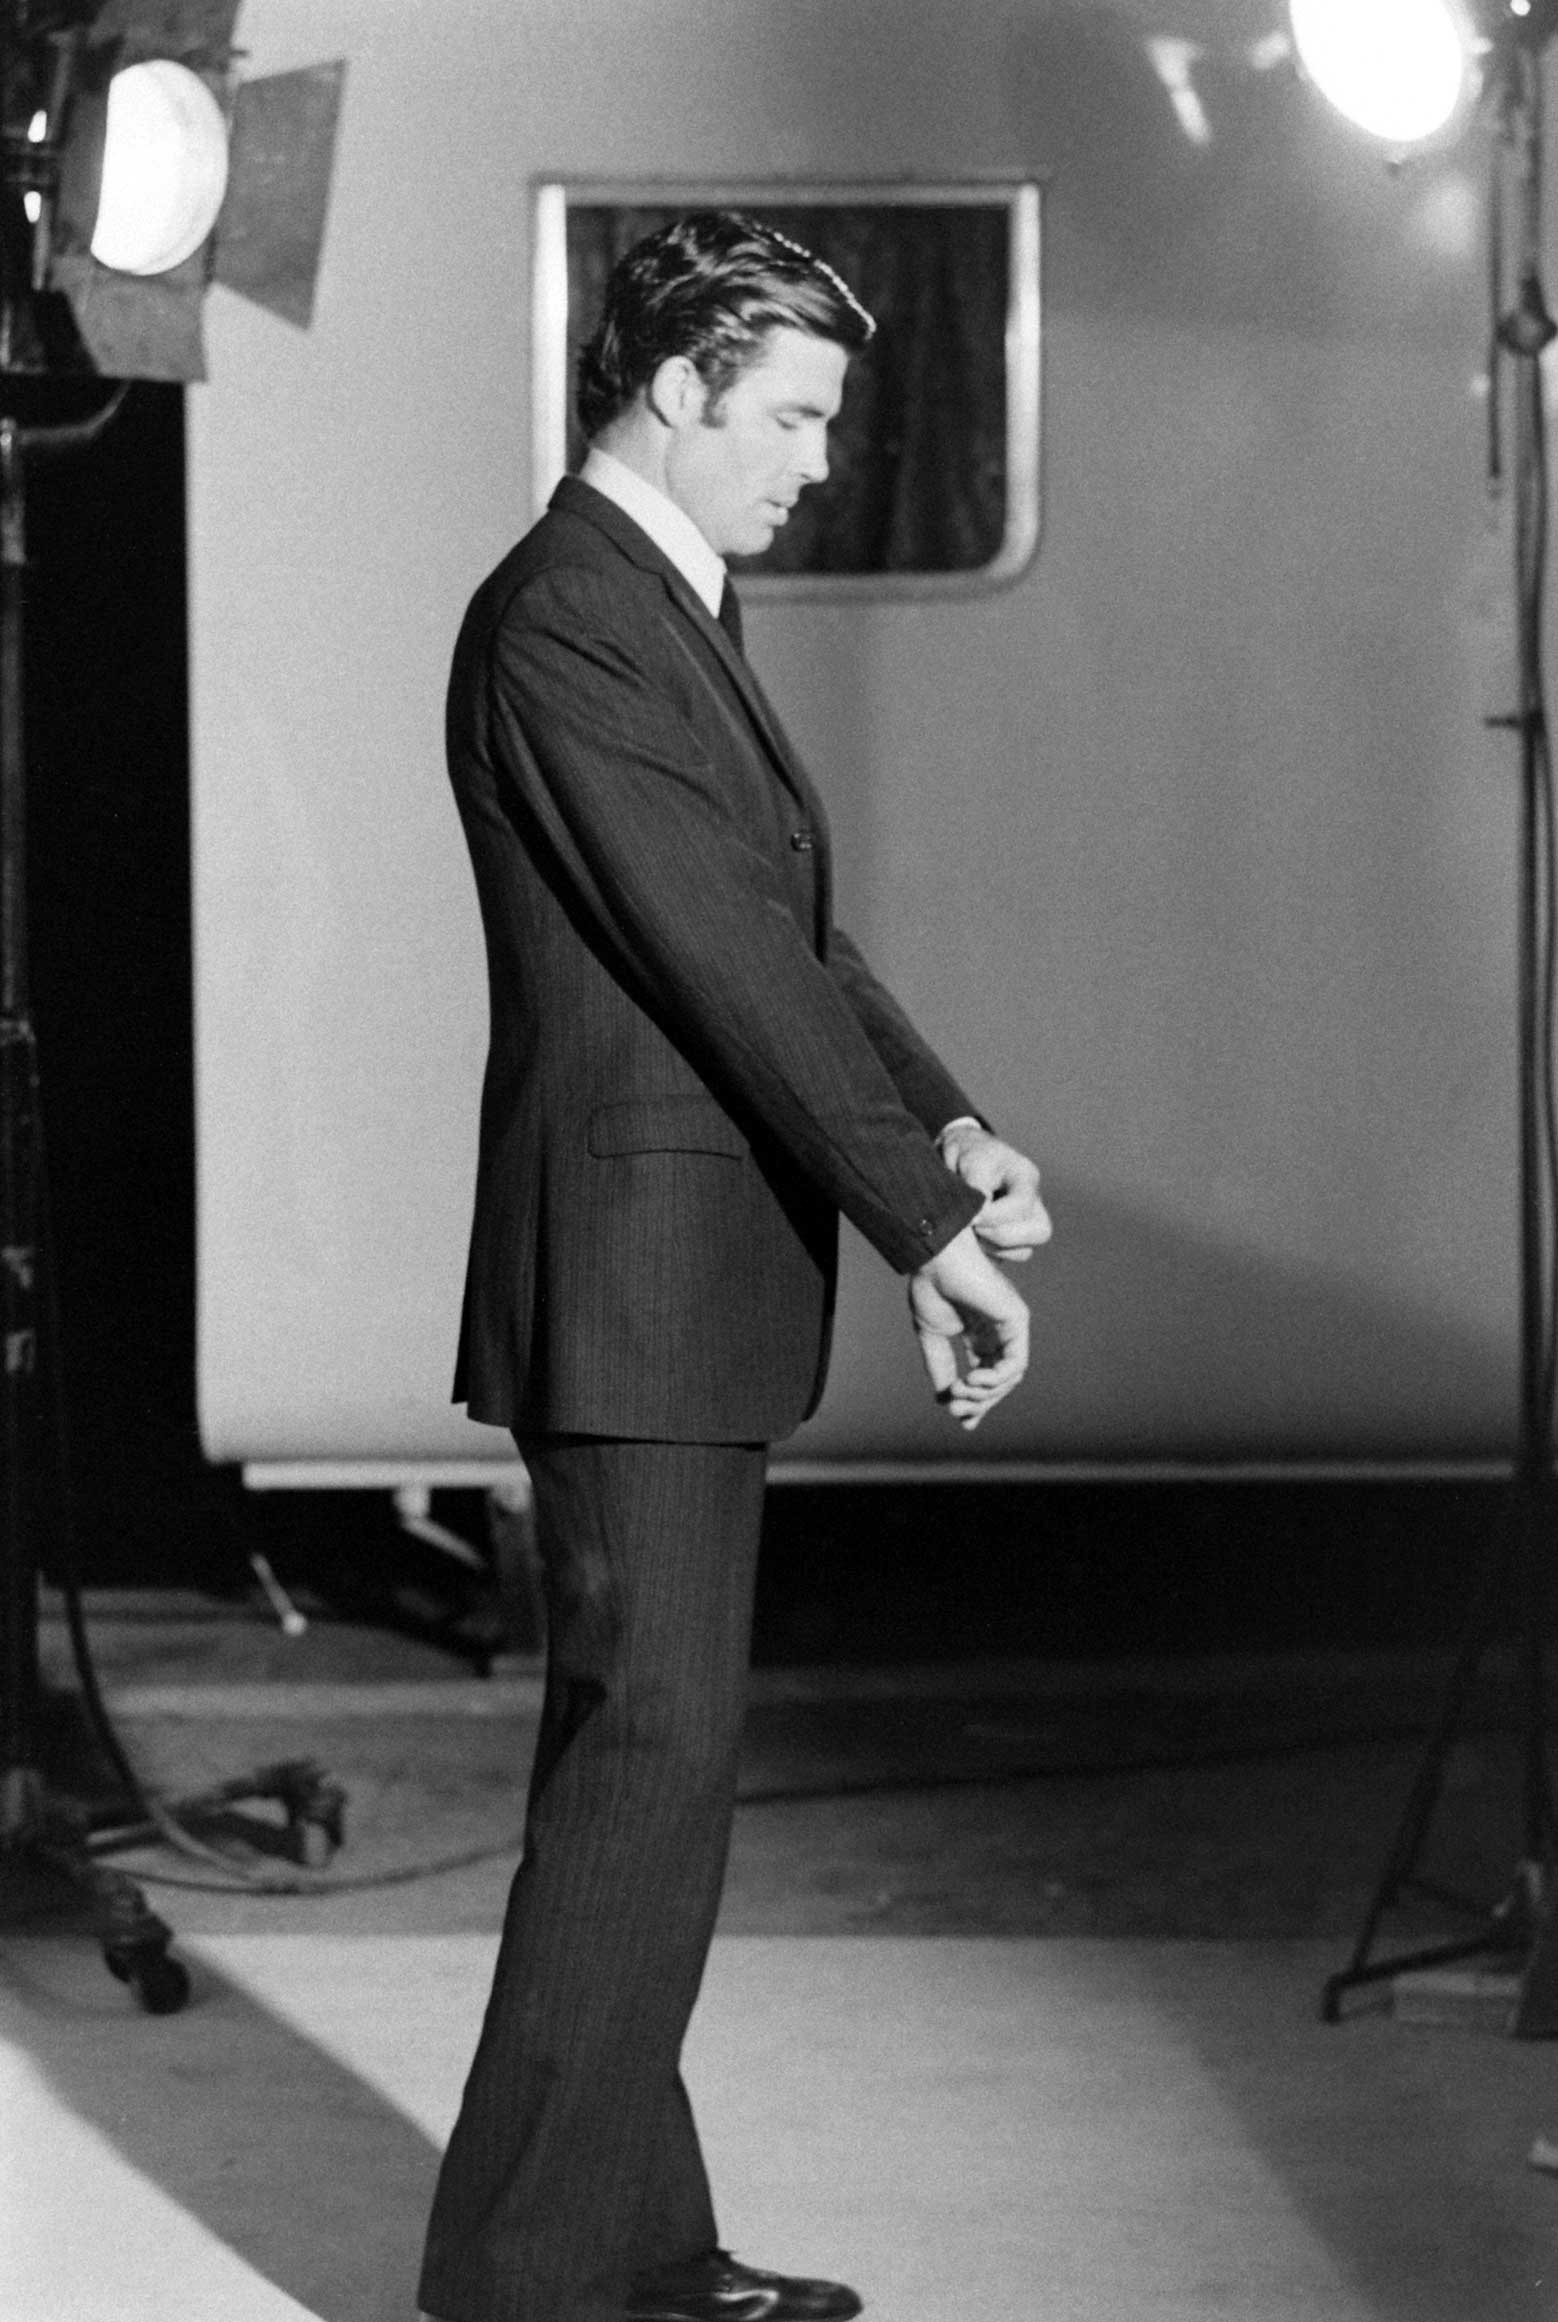 James Bond hopeful Robert Campbell adjusts his shirt and jacket, 1967.